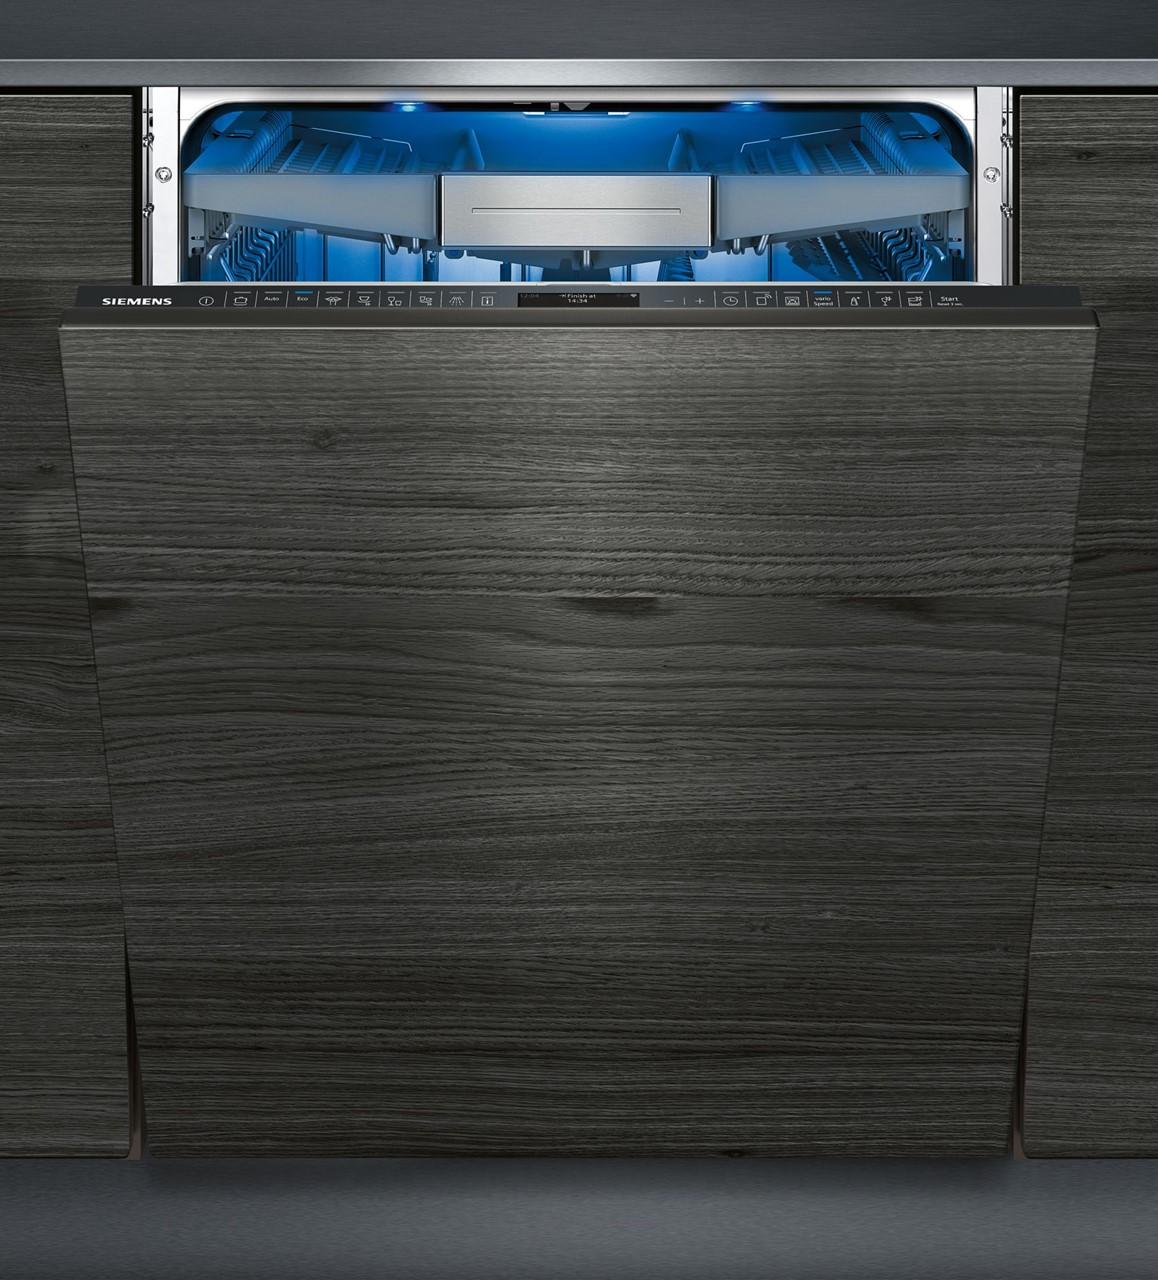 siemens vollintegrierbar geschirrsp ler 60 cm sn778d16te silver tech gmbh qualit t f r. Black Bedroom Furniture Sets. Home Design Ideas